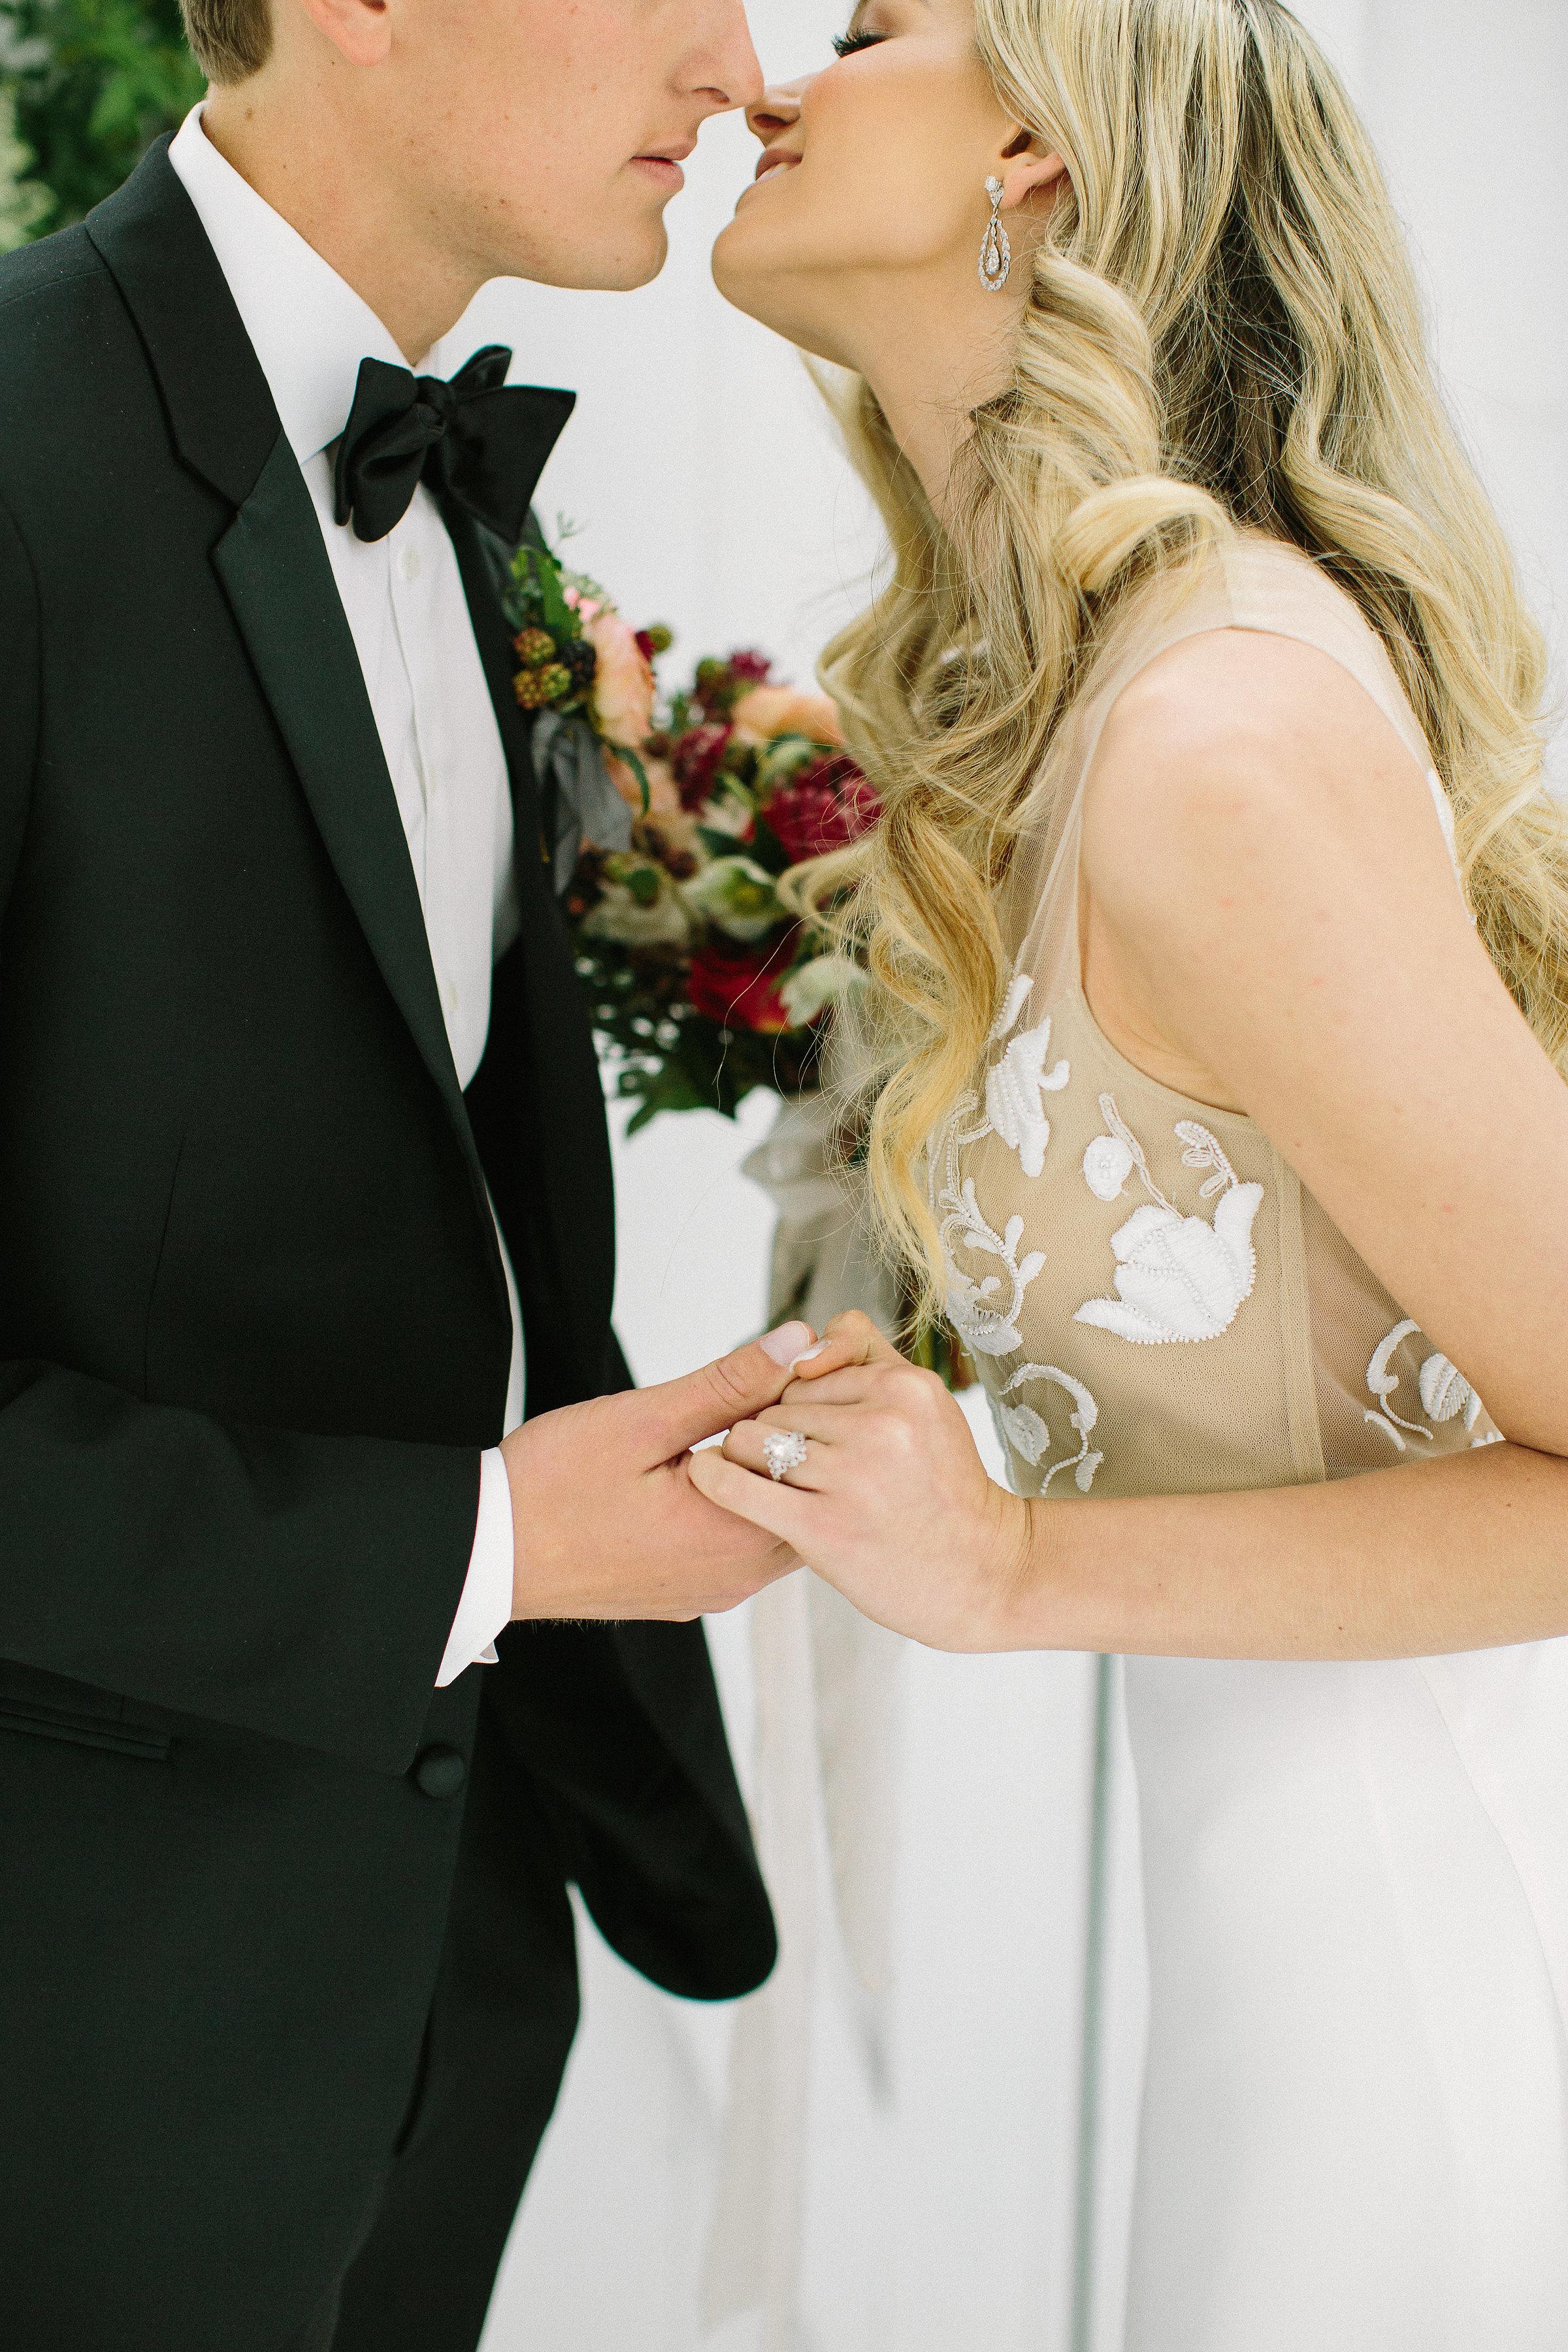 Ellen-Ashton-Photography-White-Sparrow-Weddings68 copy.jpg